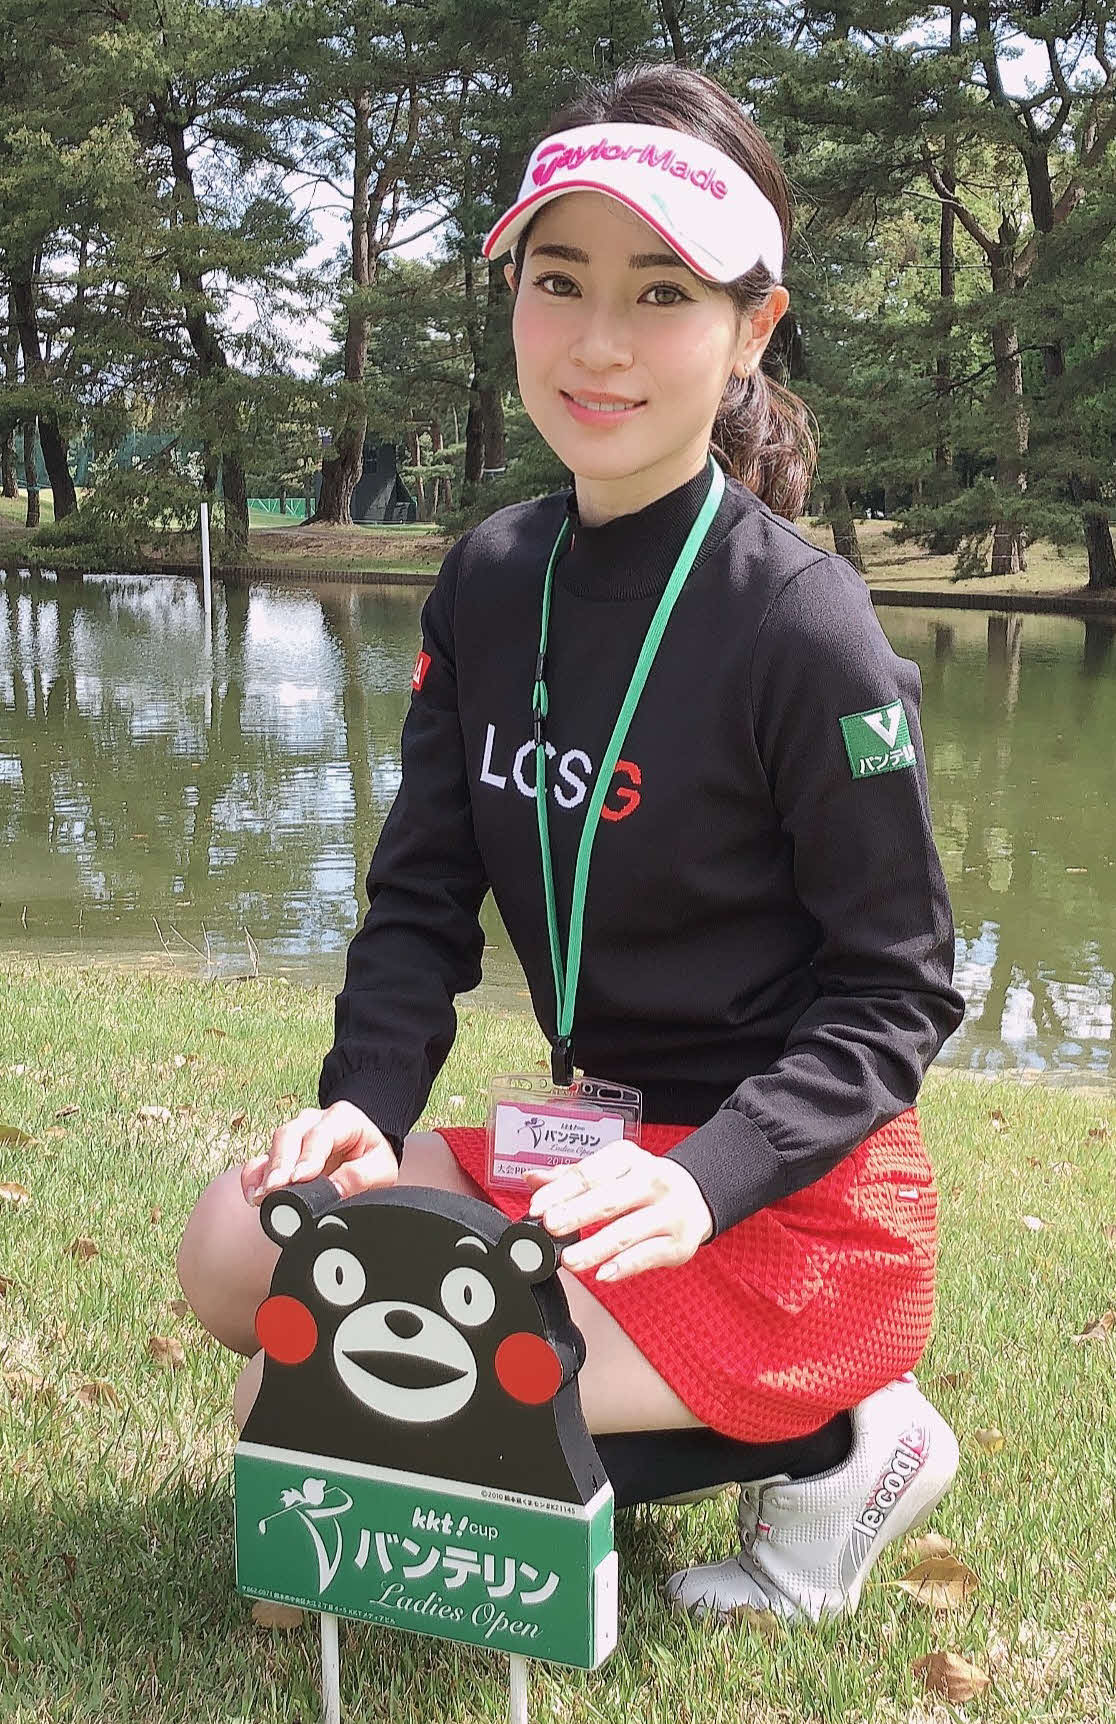 「KKT杯バンテリン・レディスオープン」の大会PRサポーターを務める竹村